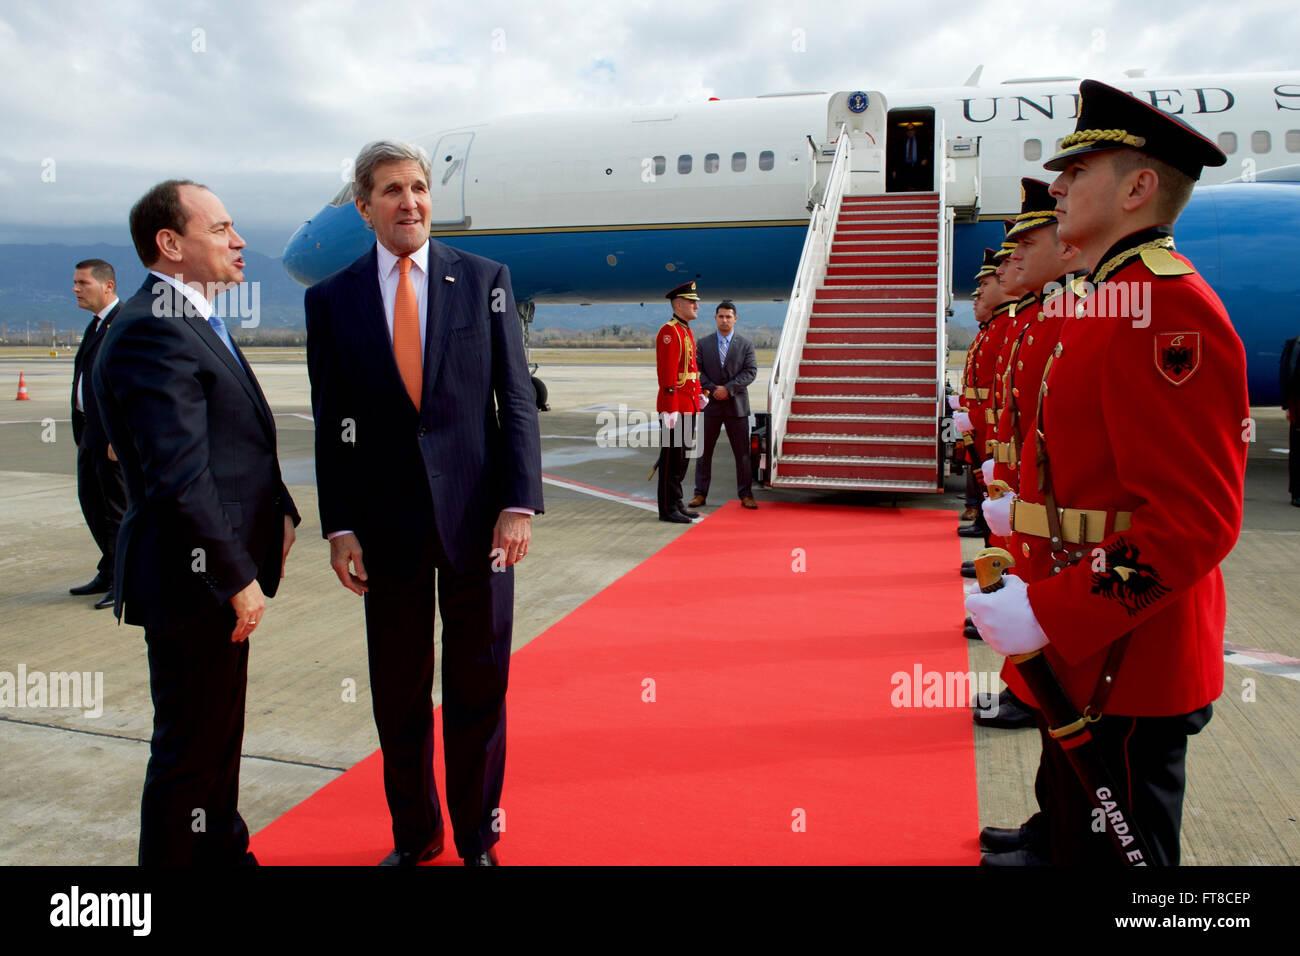 U.S. Secretary of State John Kerry chats with Albanian President Bujar Nishani after arriving at Tirana International - Stock Image